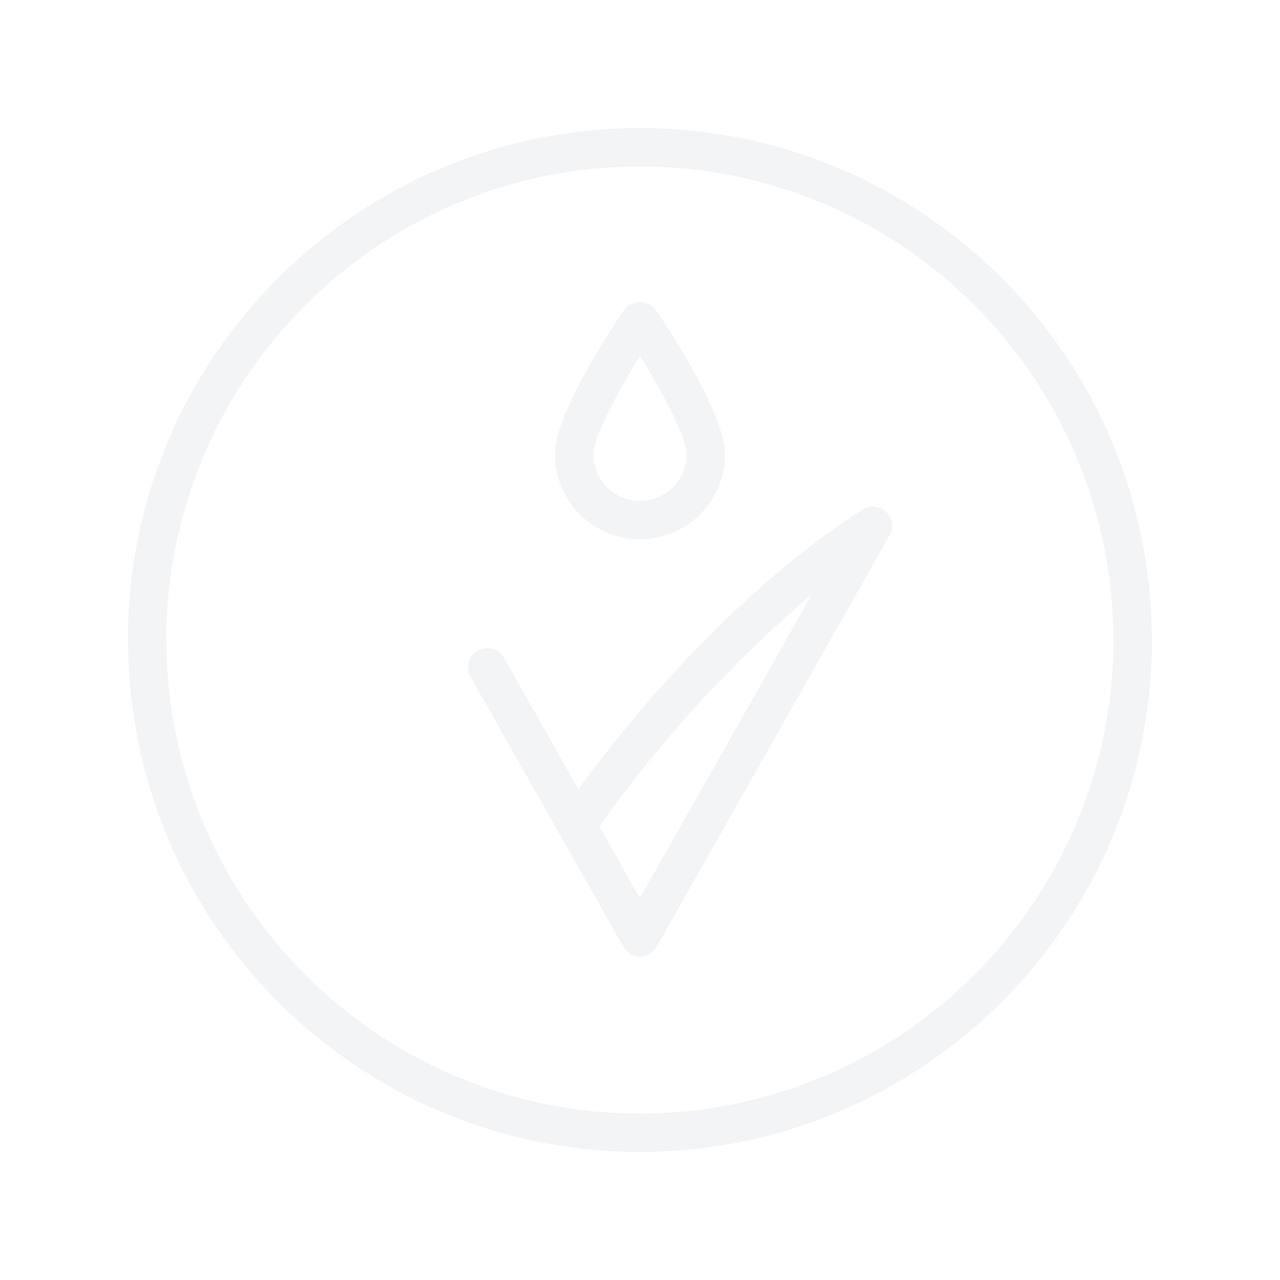 Dr. Hauschka Med Ice Plant Face Cream 40ml